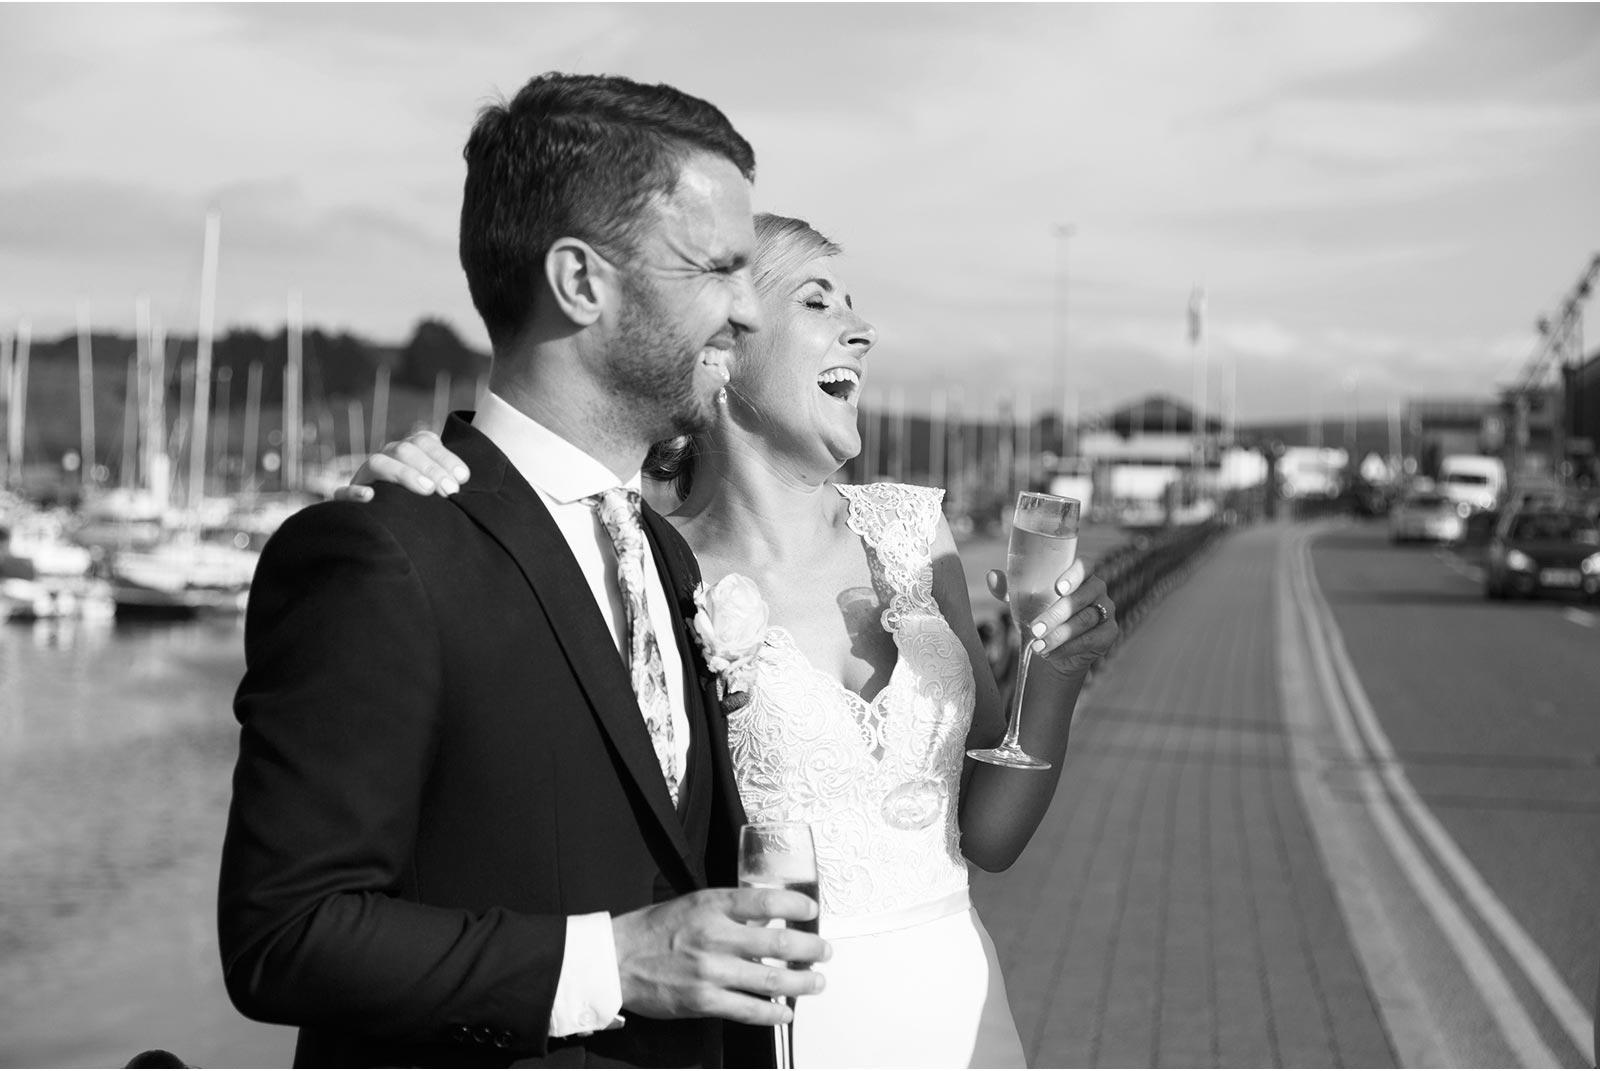 Candid wedding photographer Cork